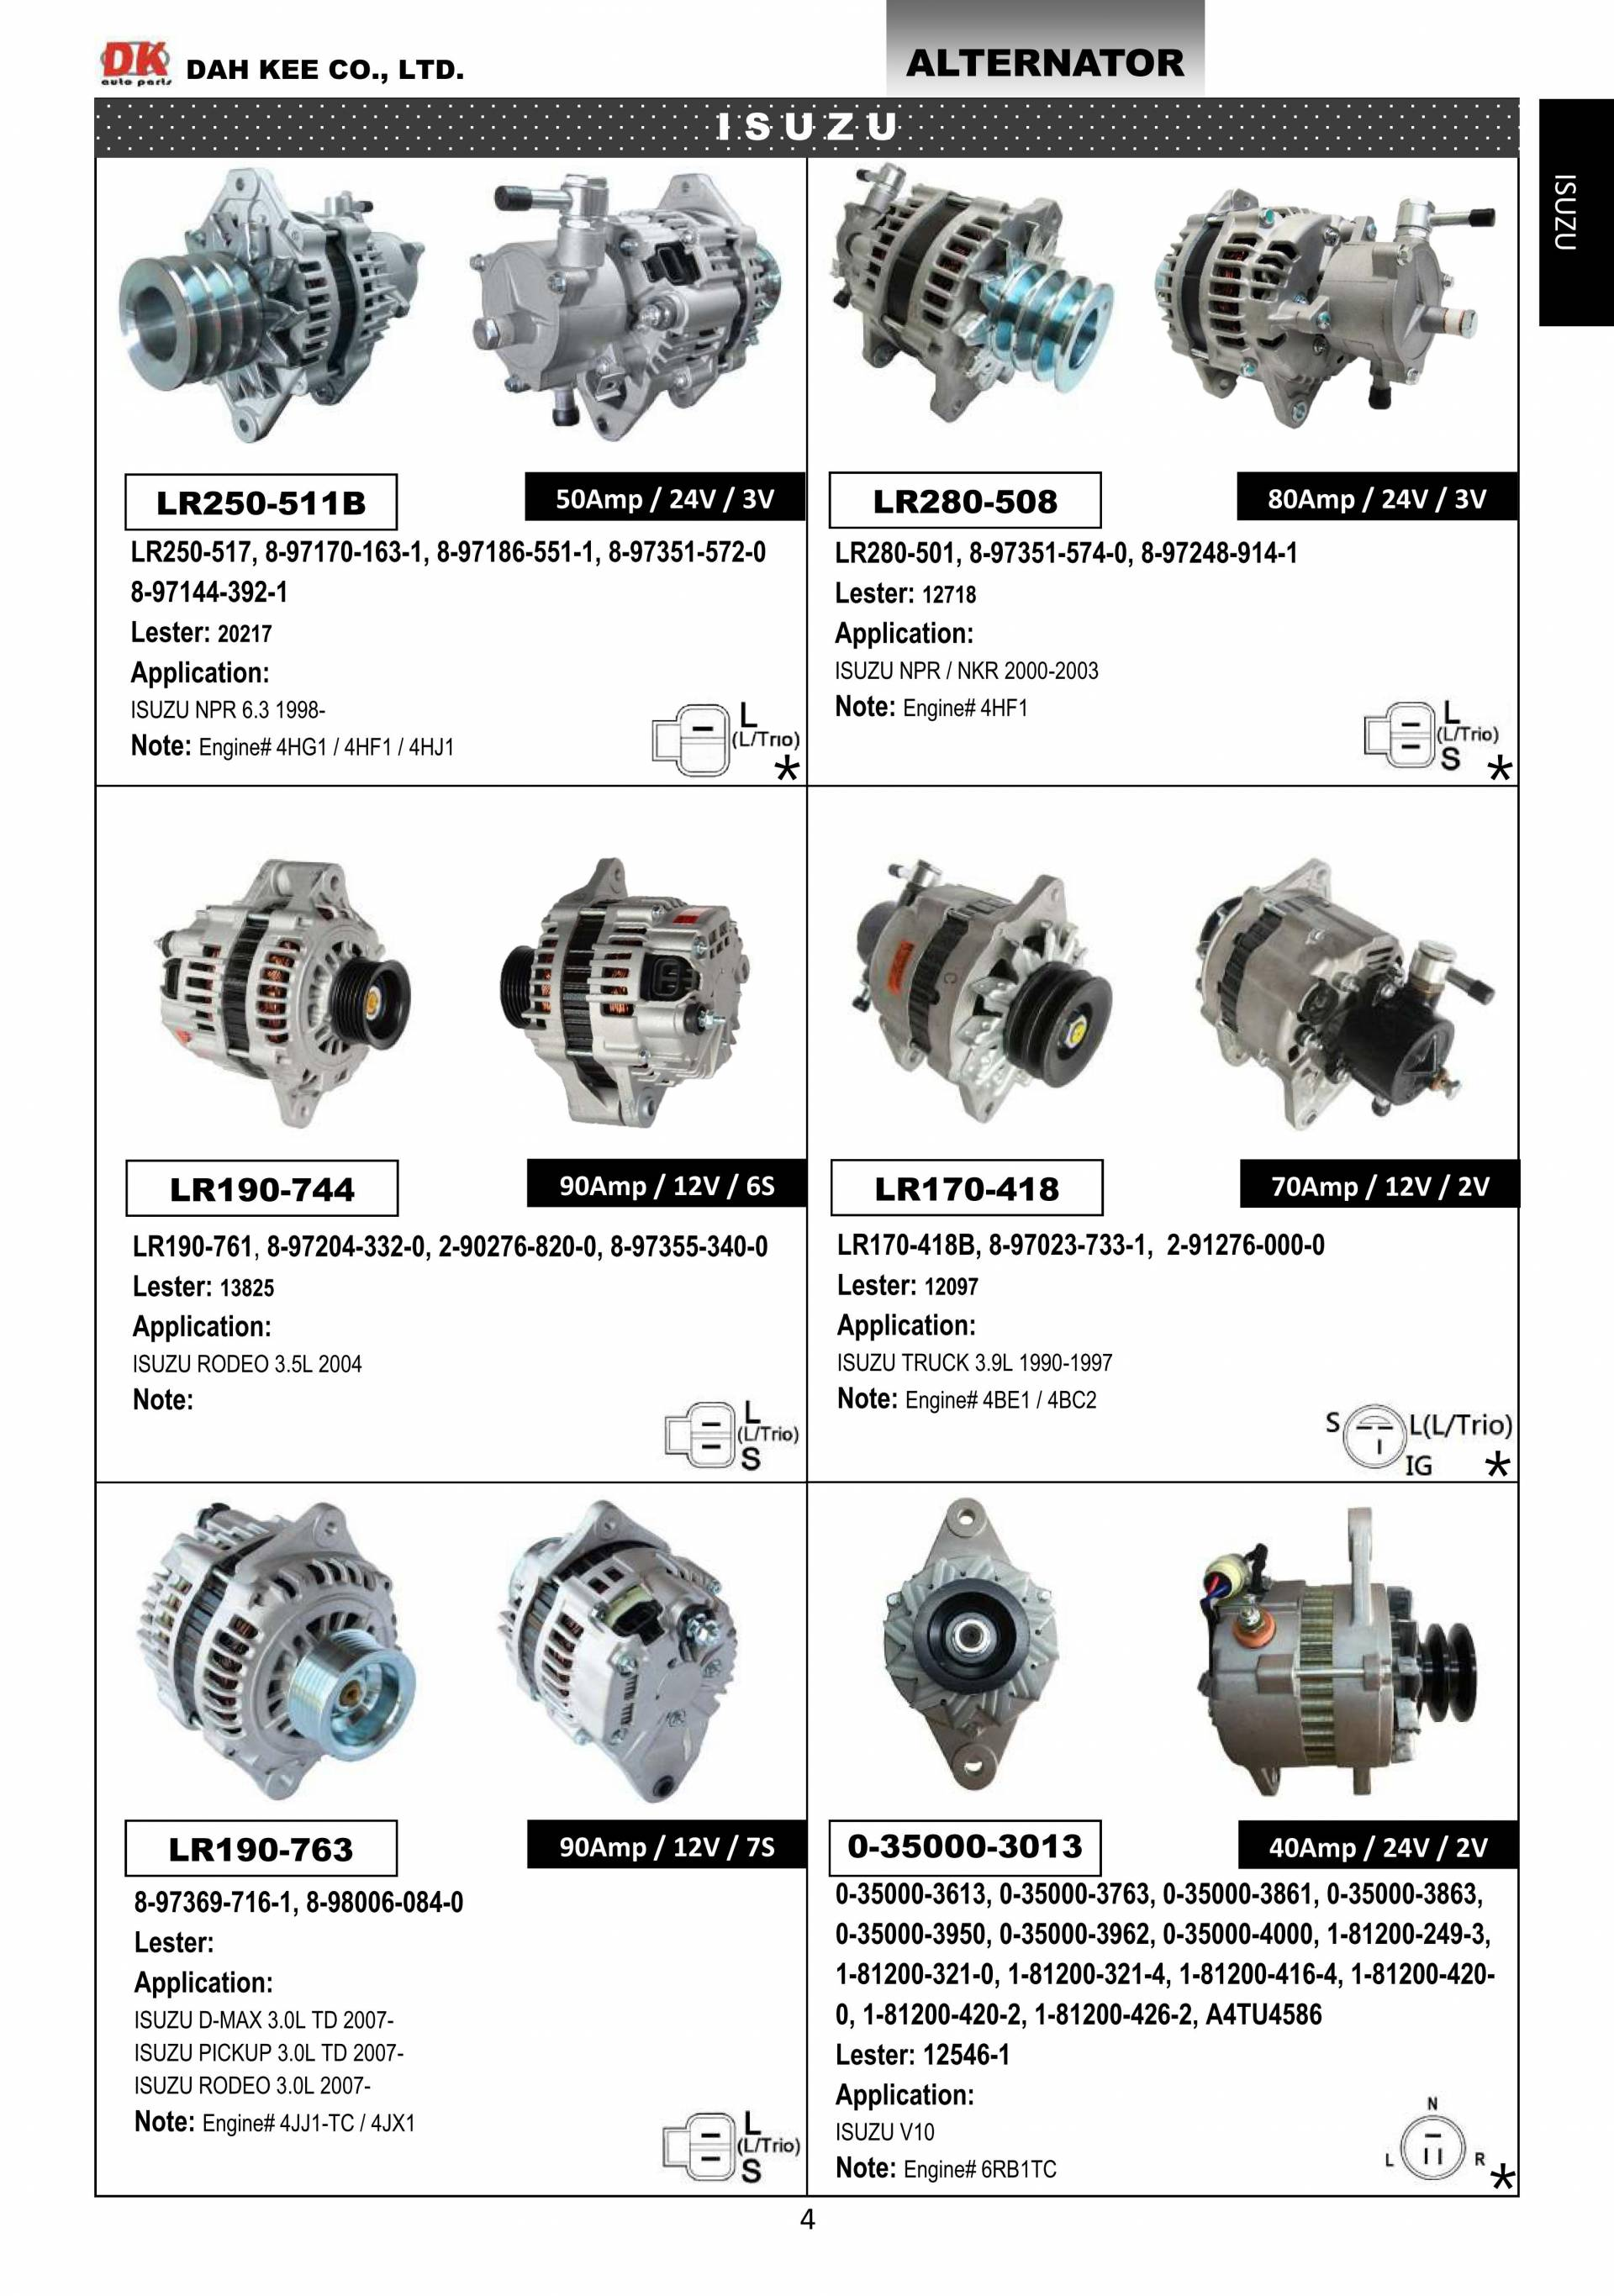 2019 DAH KEE CATALOG | All Brands Car Ignition Distributors